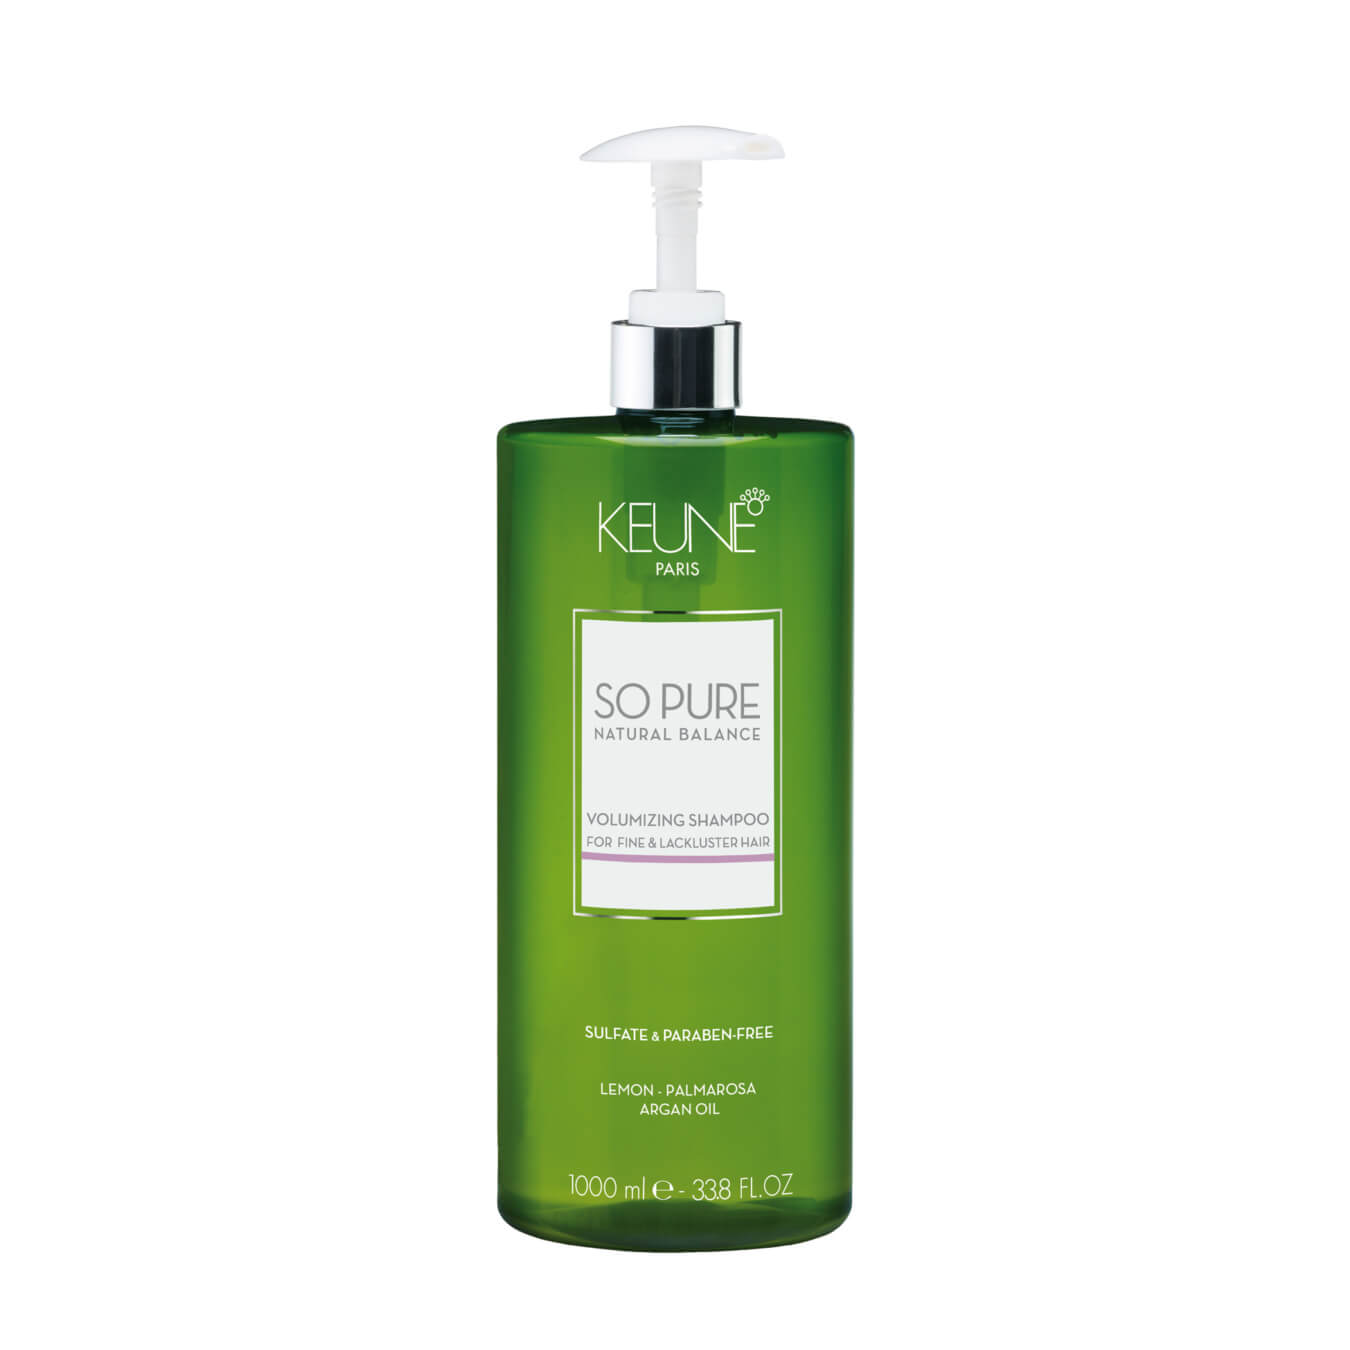 Kauf Keune So Pure Volumizing Shampoo 1000ml